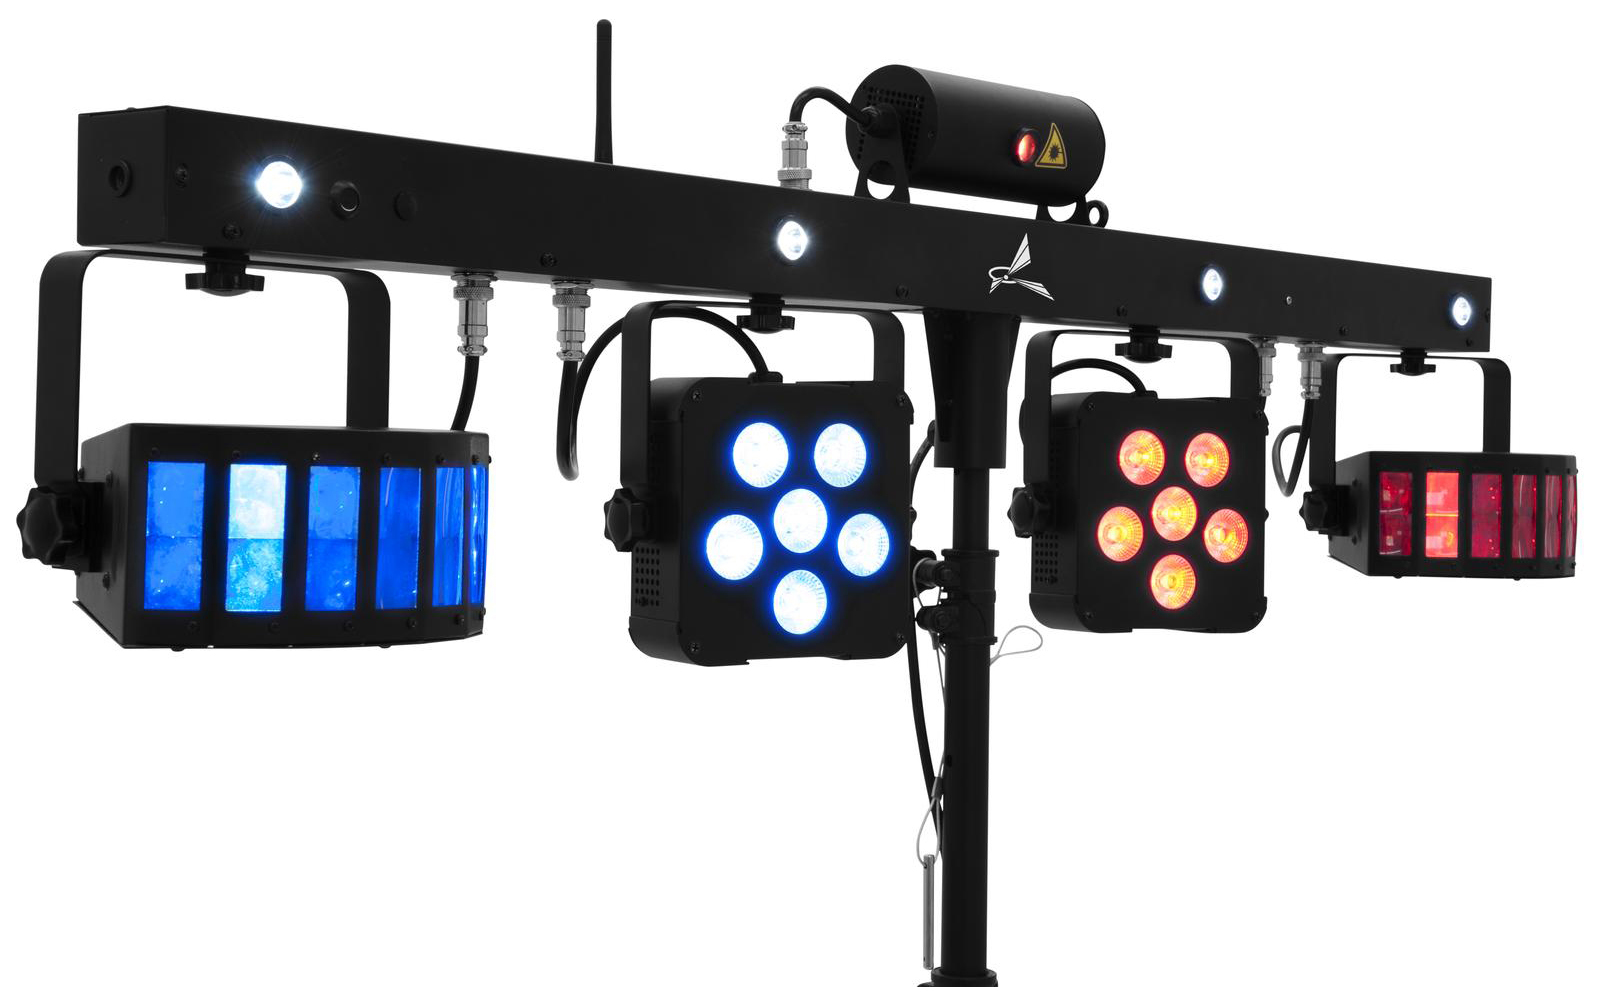 eurolite-led-kls-laser-bar-pro-fx-lichtset